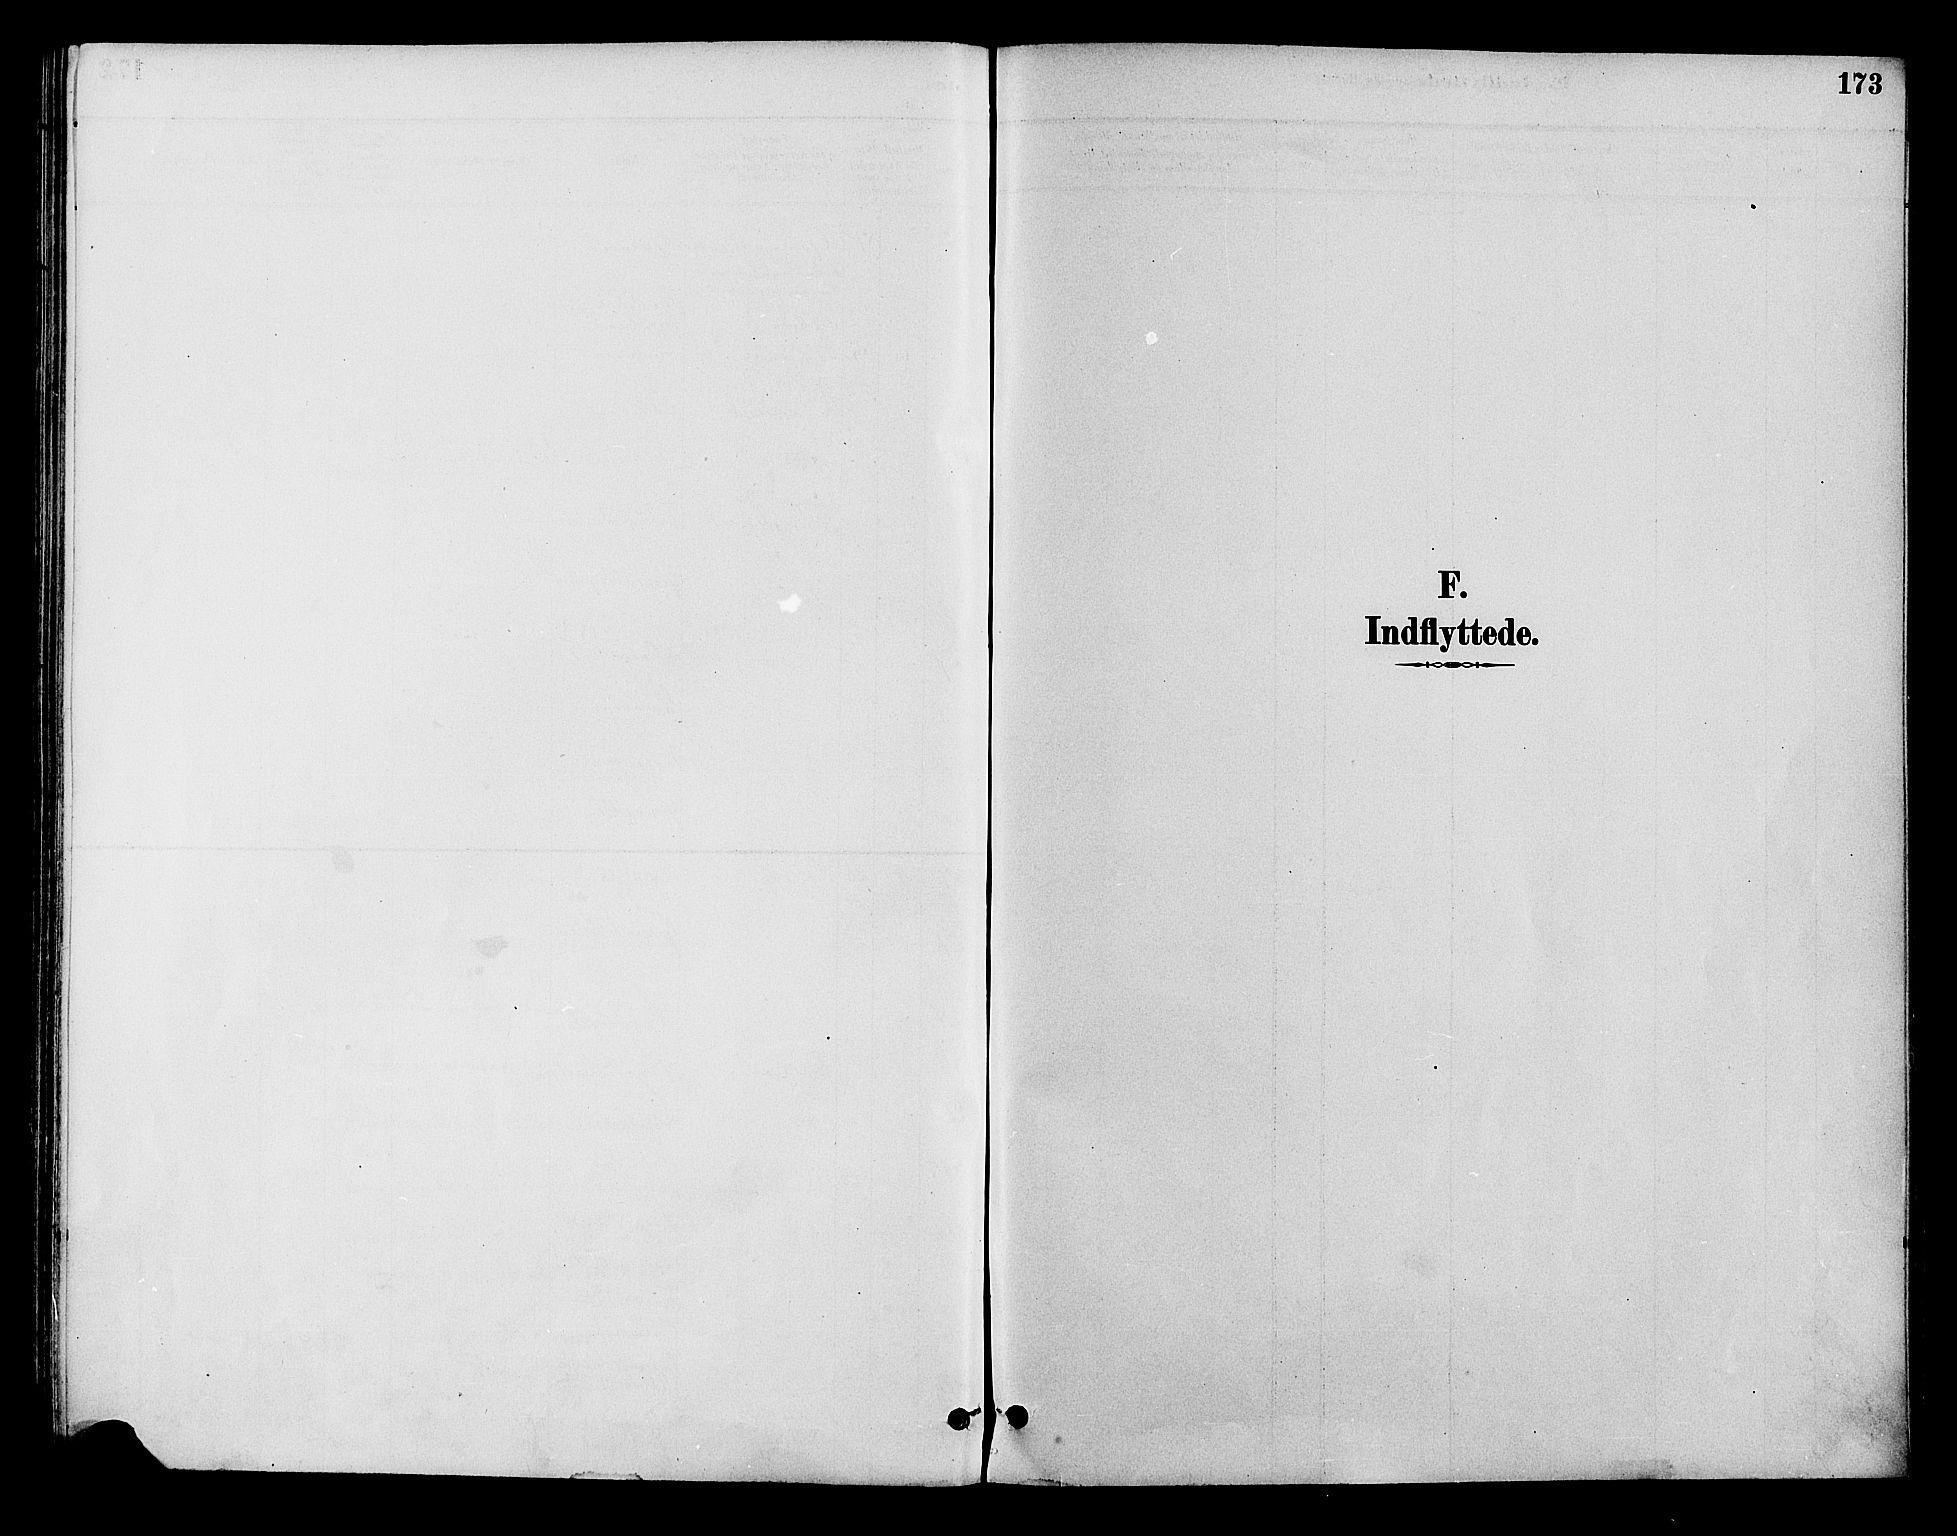 SAH, Lom prestekontor, K/L0008: Parish register (official) no. 8, 1885-1898, p. 173